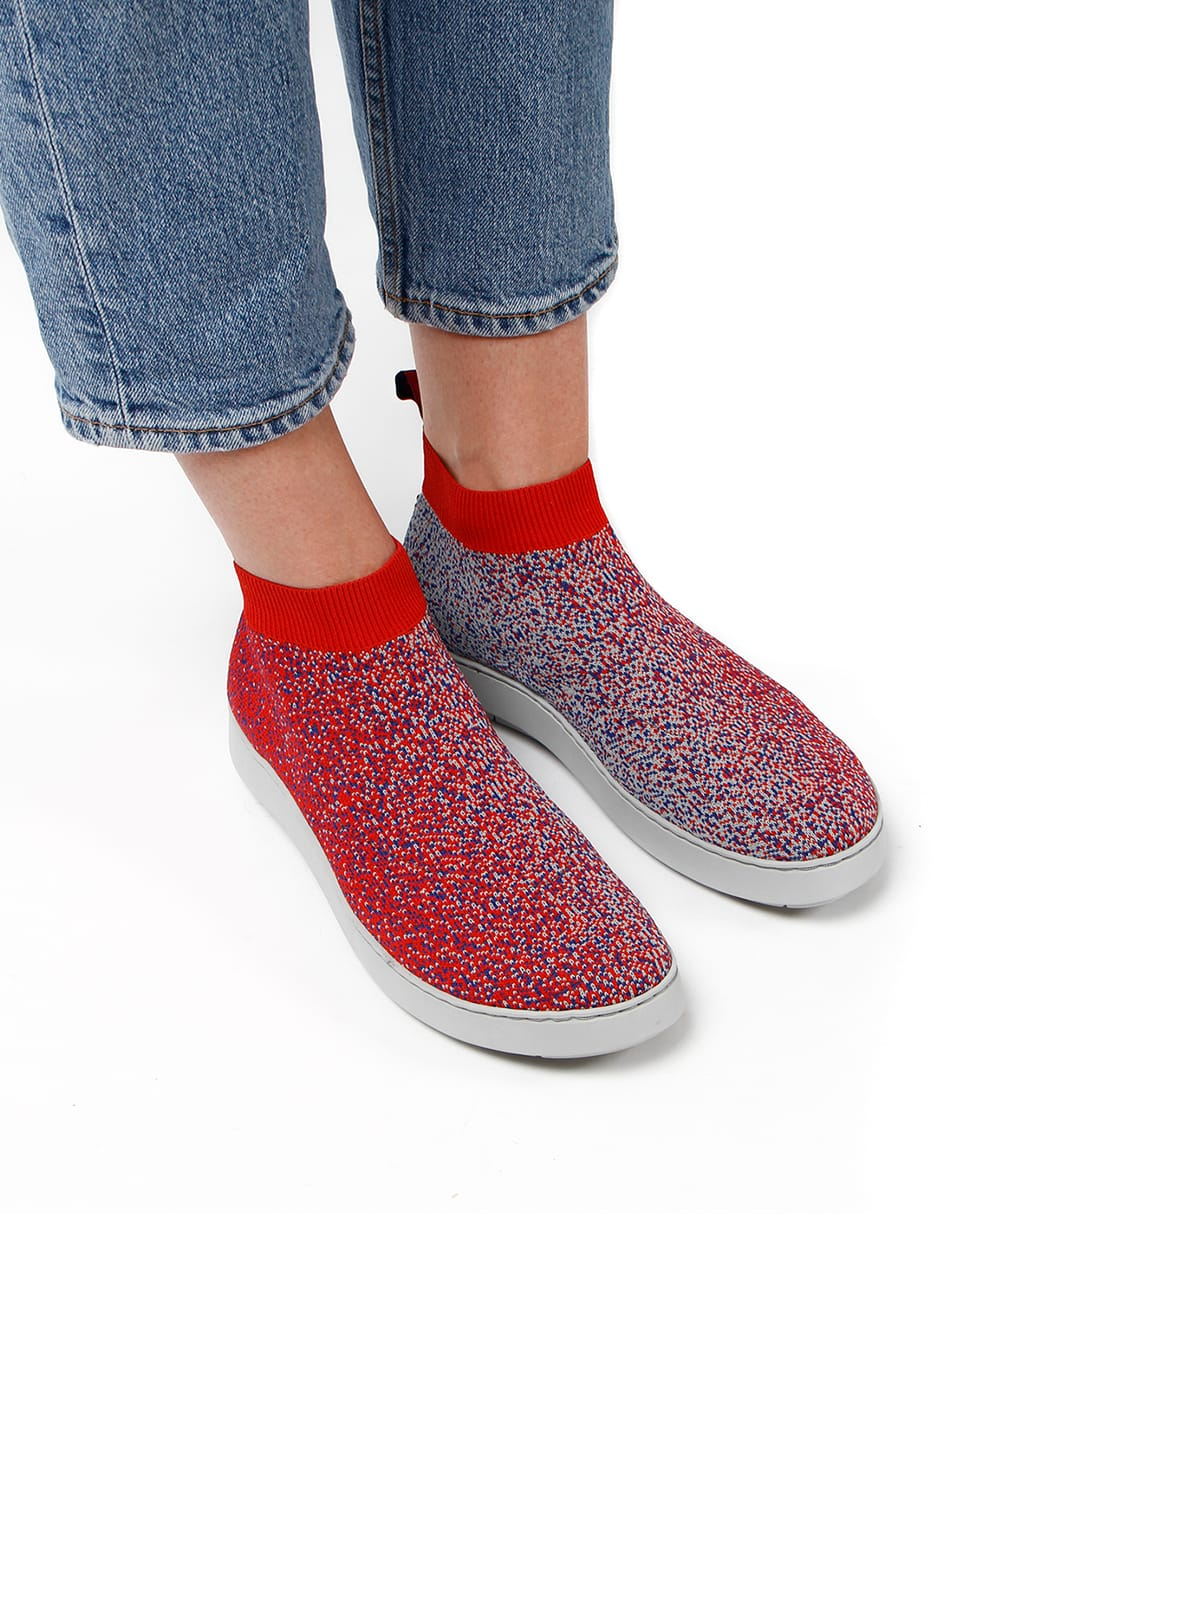 3D knitted sockboot Spexx poppy schräg